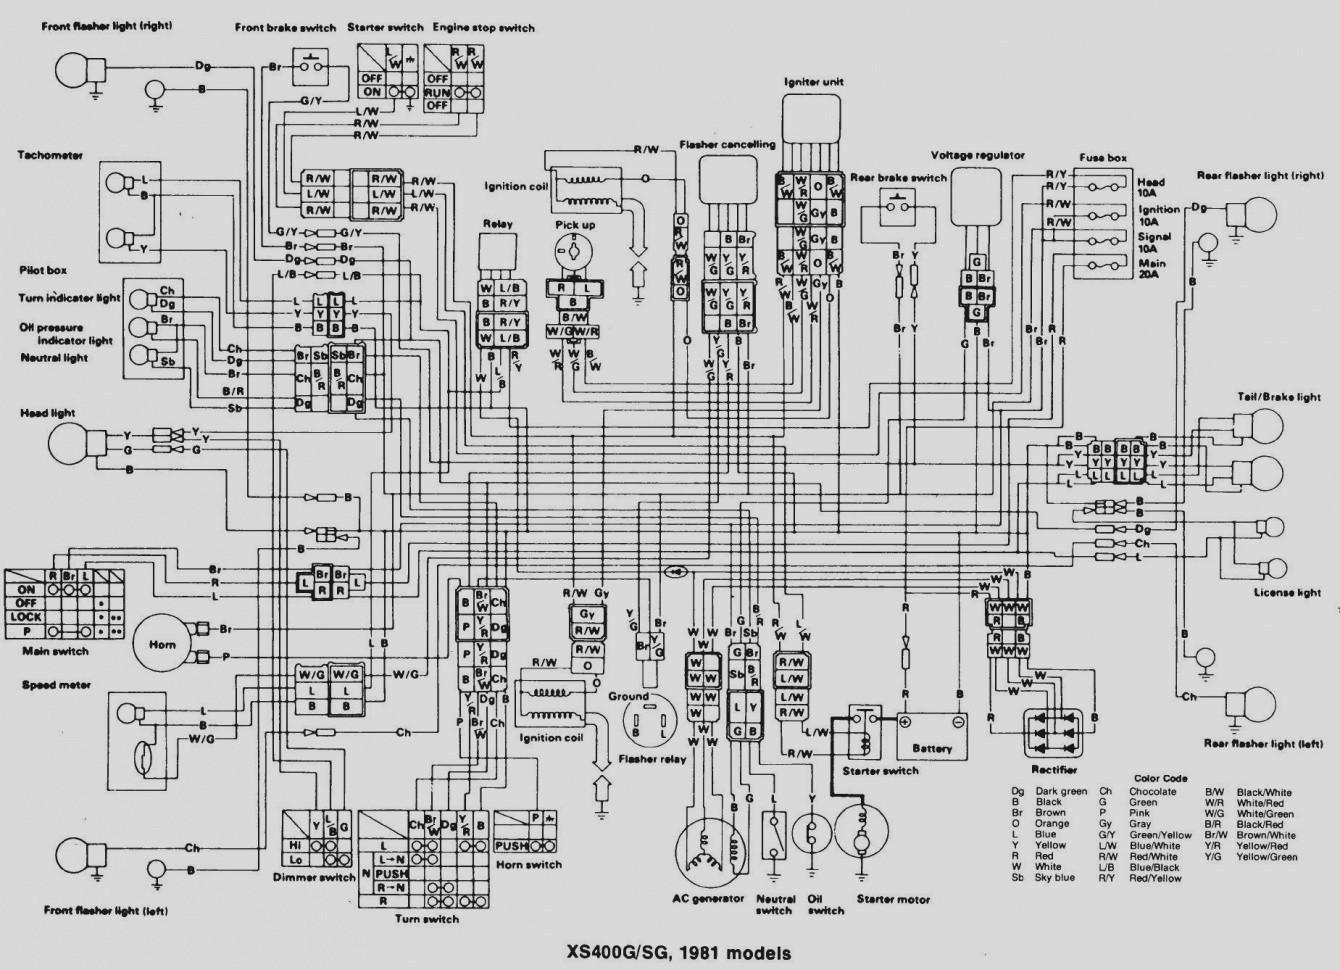 1994 yamaha banshee wiring diagram wells cargo trailer switch for big bear 4x4 library